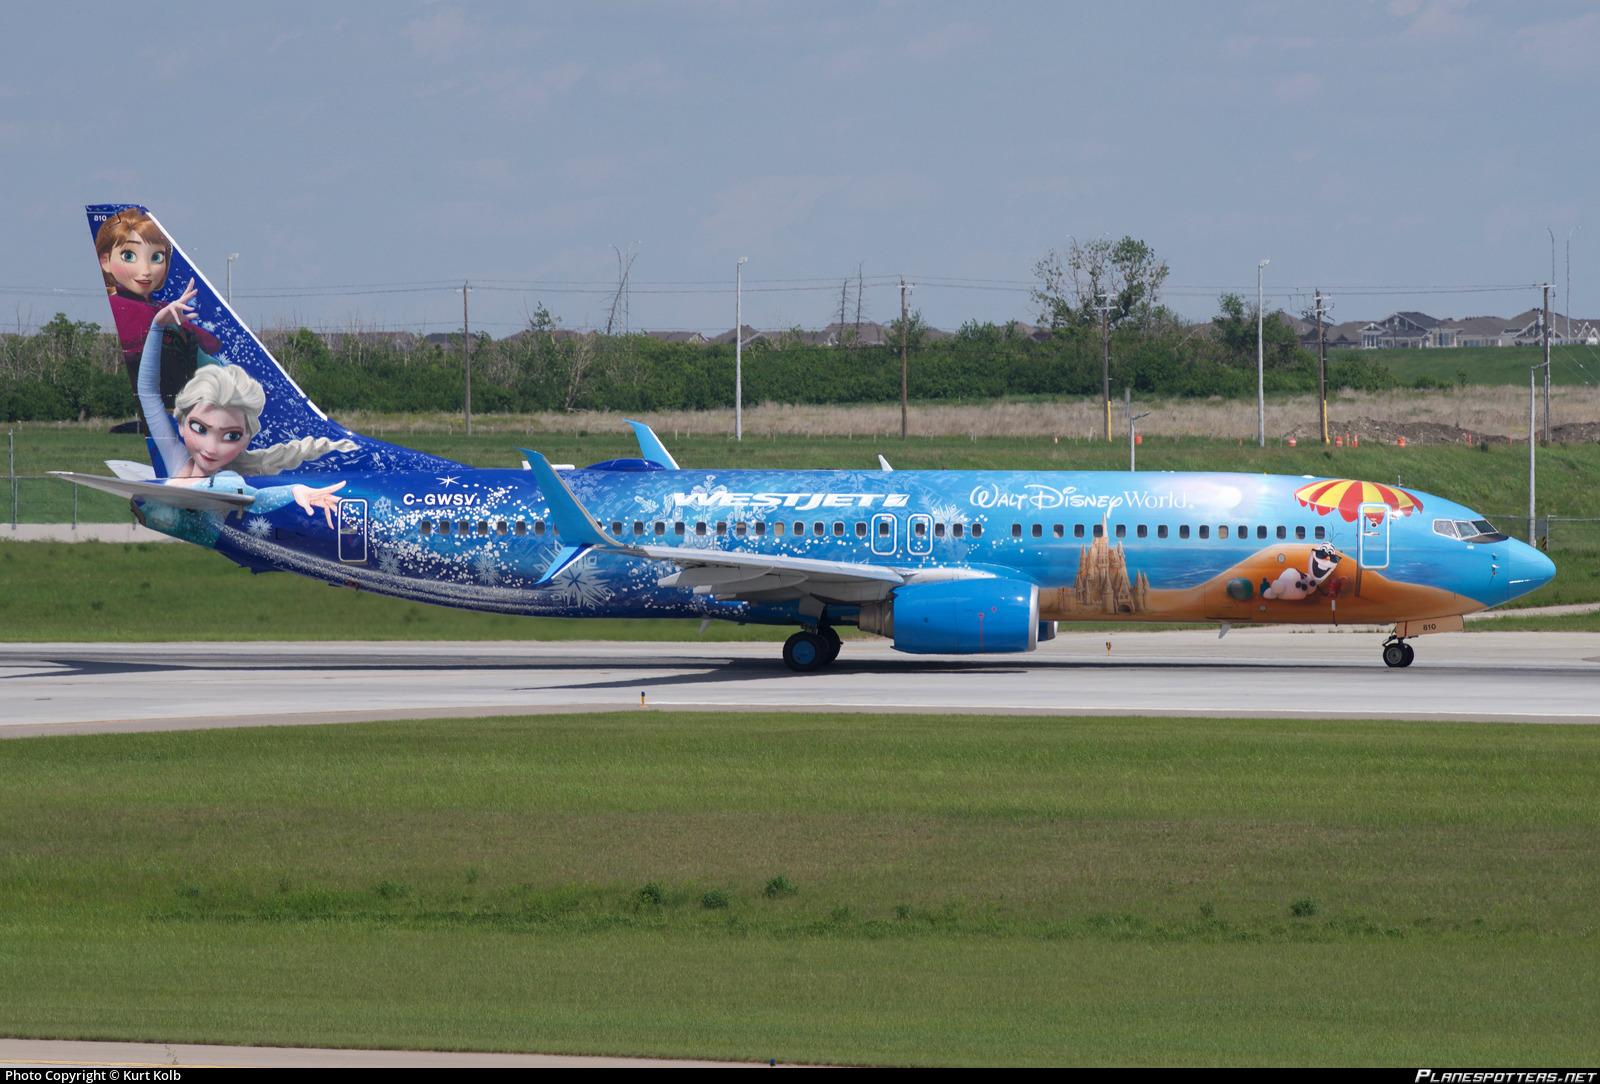 IMAGE: https://cdn.planespotters.net/photo/967000/original/c-gwsv-westjet-boeing-737-8ctwl_PlanespottersNet_967949_865ed15575.jpg